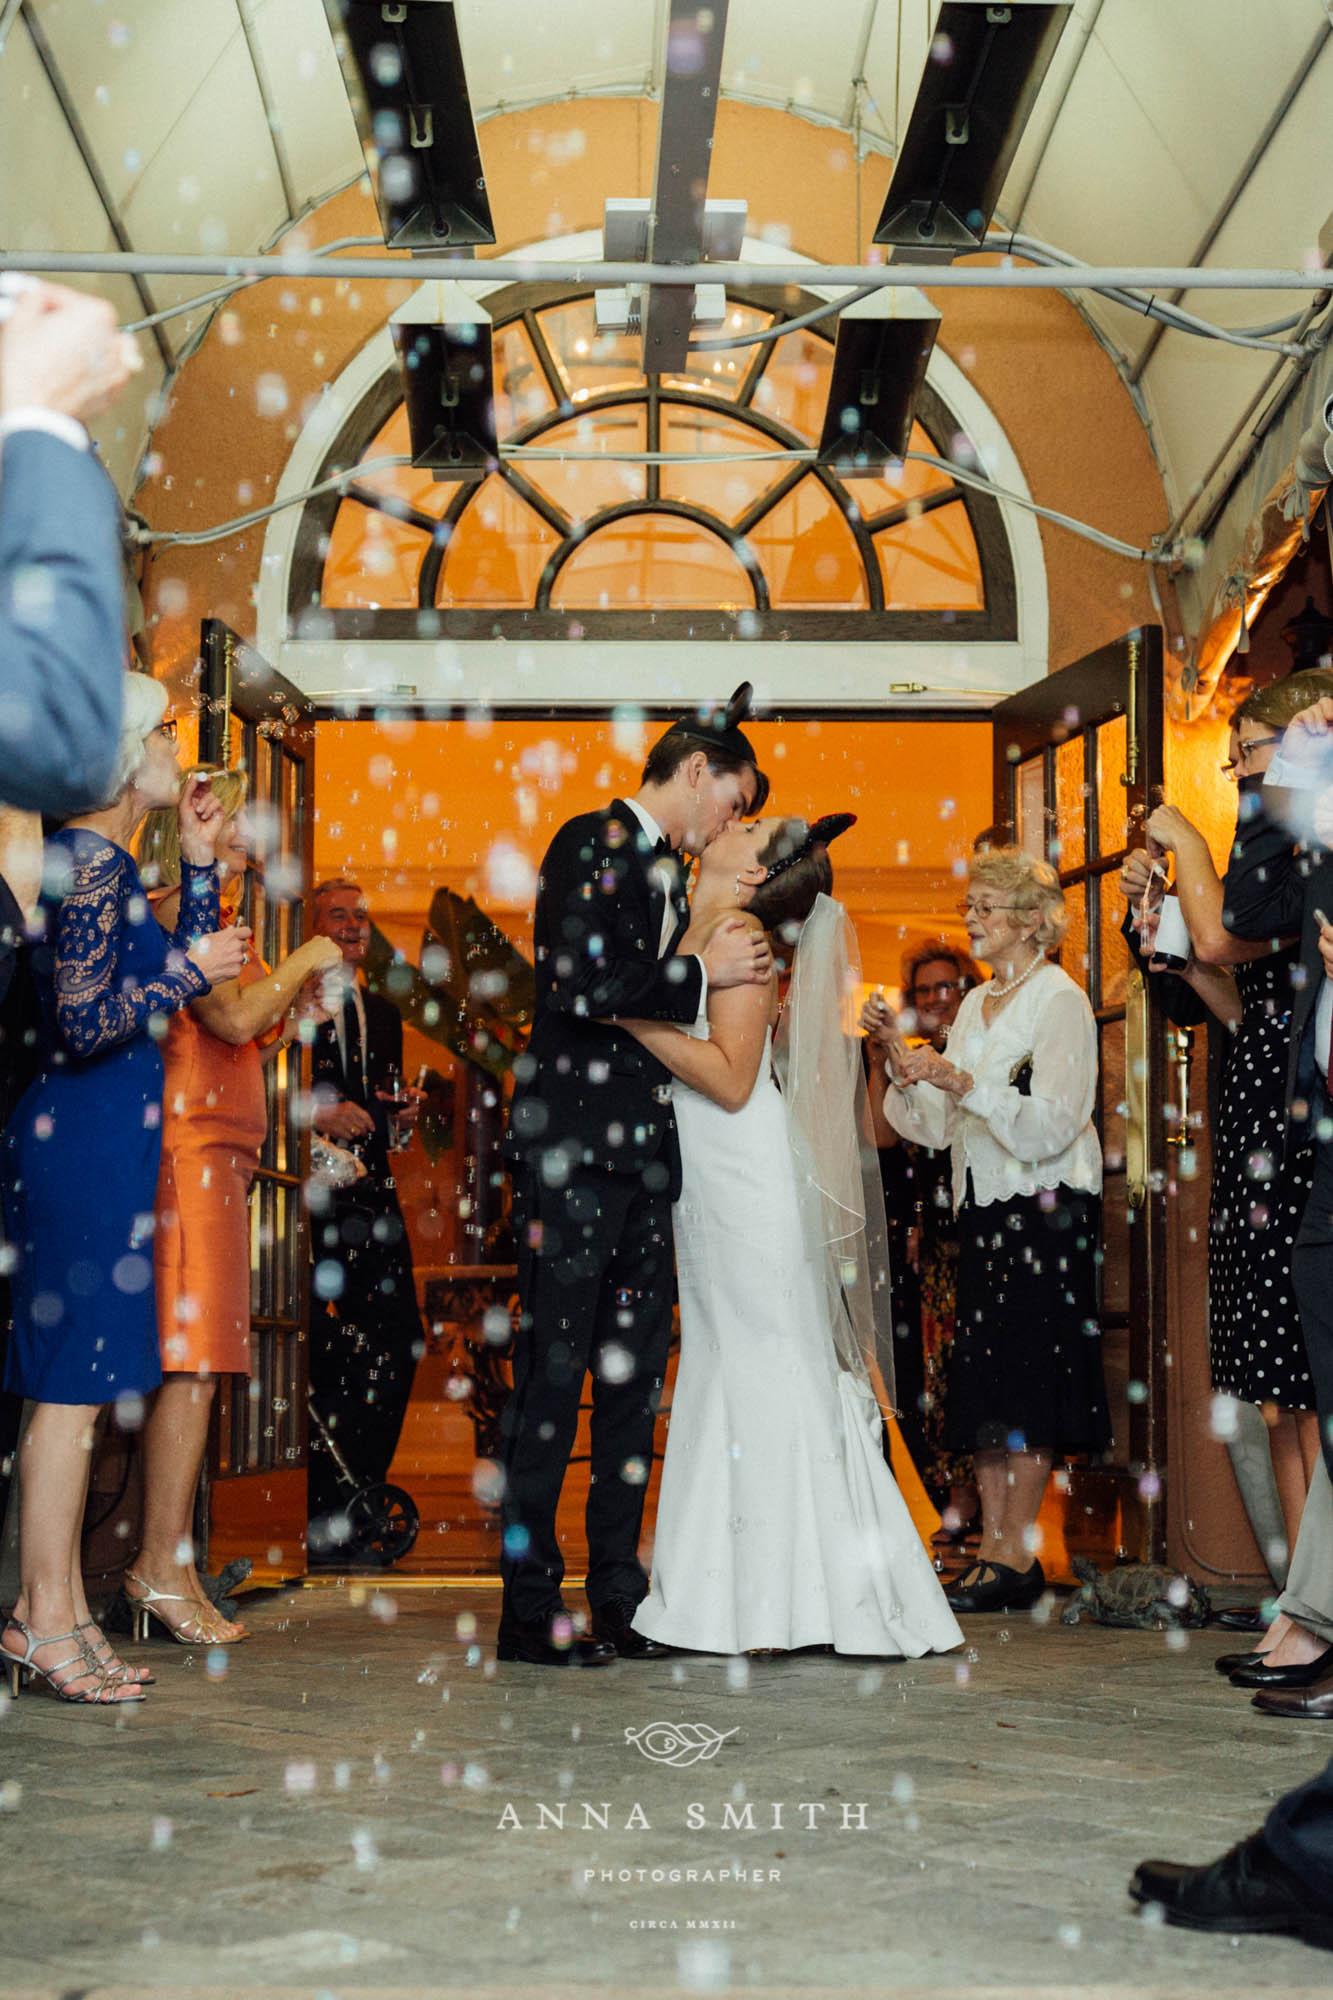 WEB 2016-6-W-CD-courtney brett the mansion on turtle creek wedding anna smith photography  (864 of 879).jpg